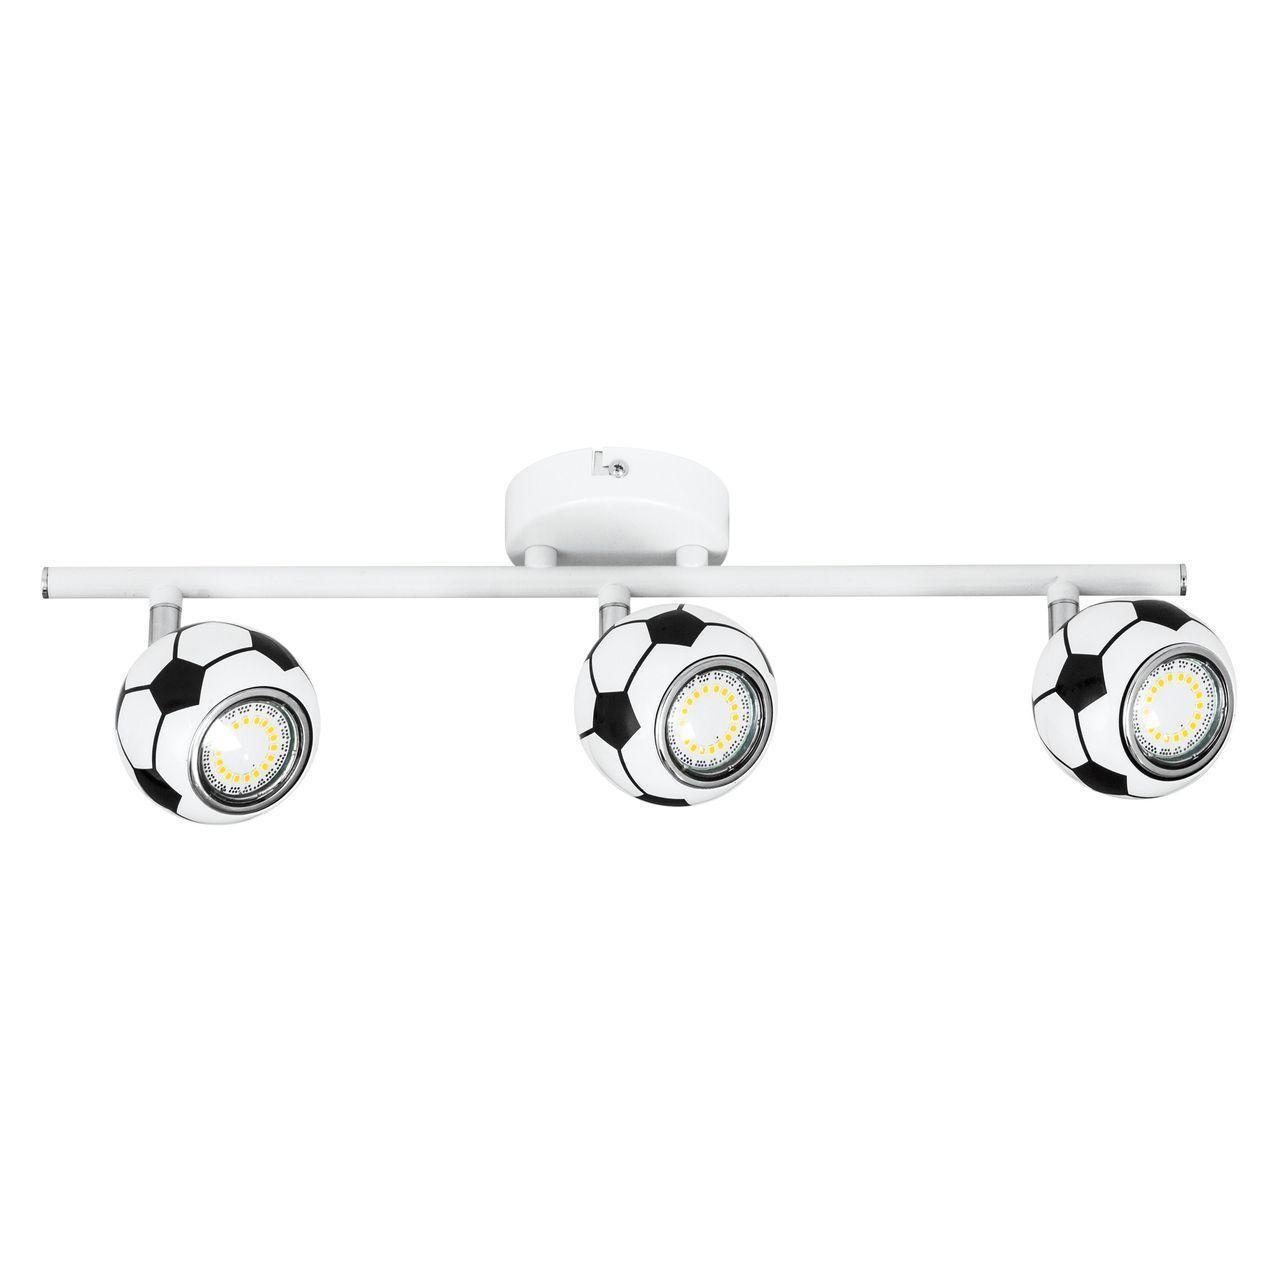 Спот Spot Light 2400304, GU10, 50 Вт спот spot light island 2041335l